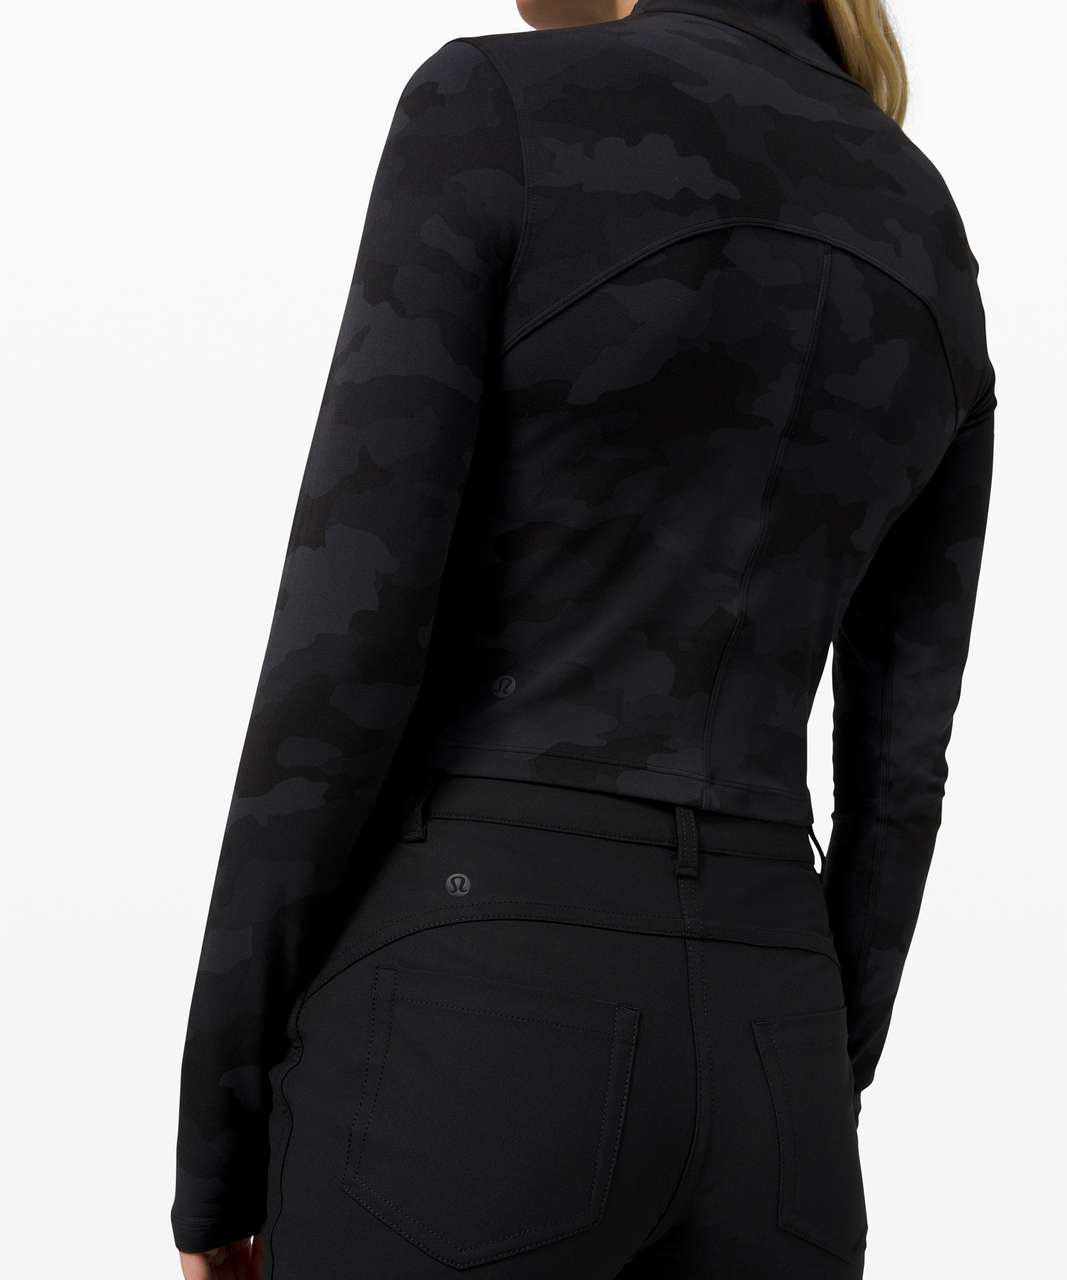 Lululemon All Aligned Mock Neck Long Sleeve *Nulu - Heritage 365 Camo Deep Coal Multi